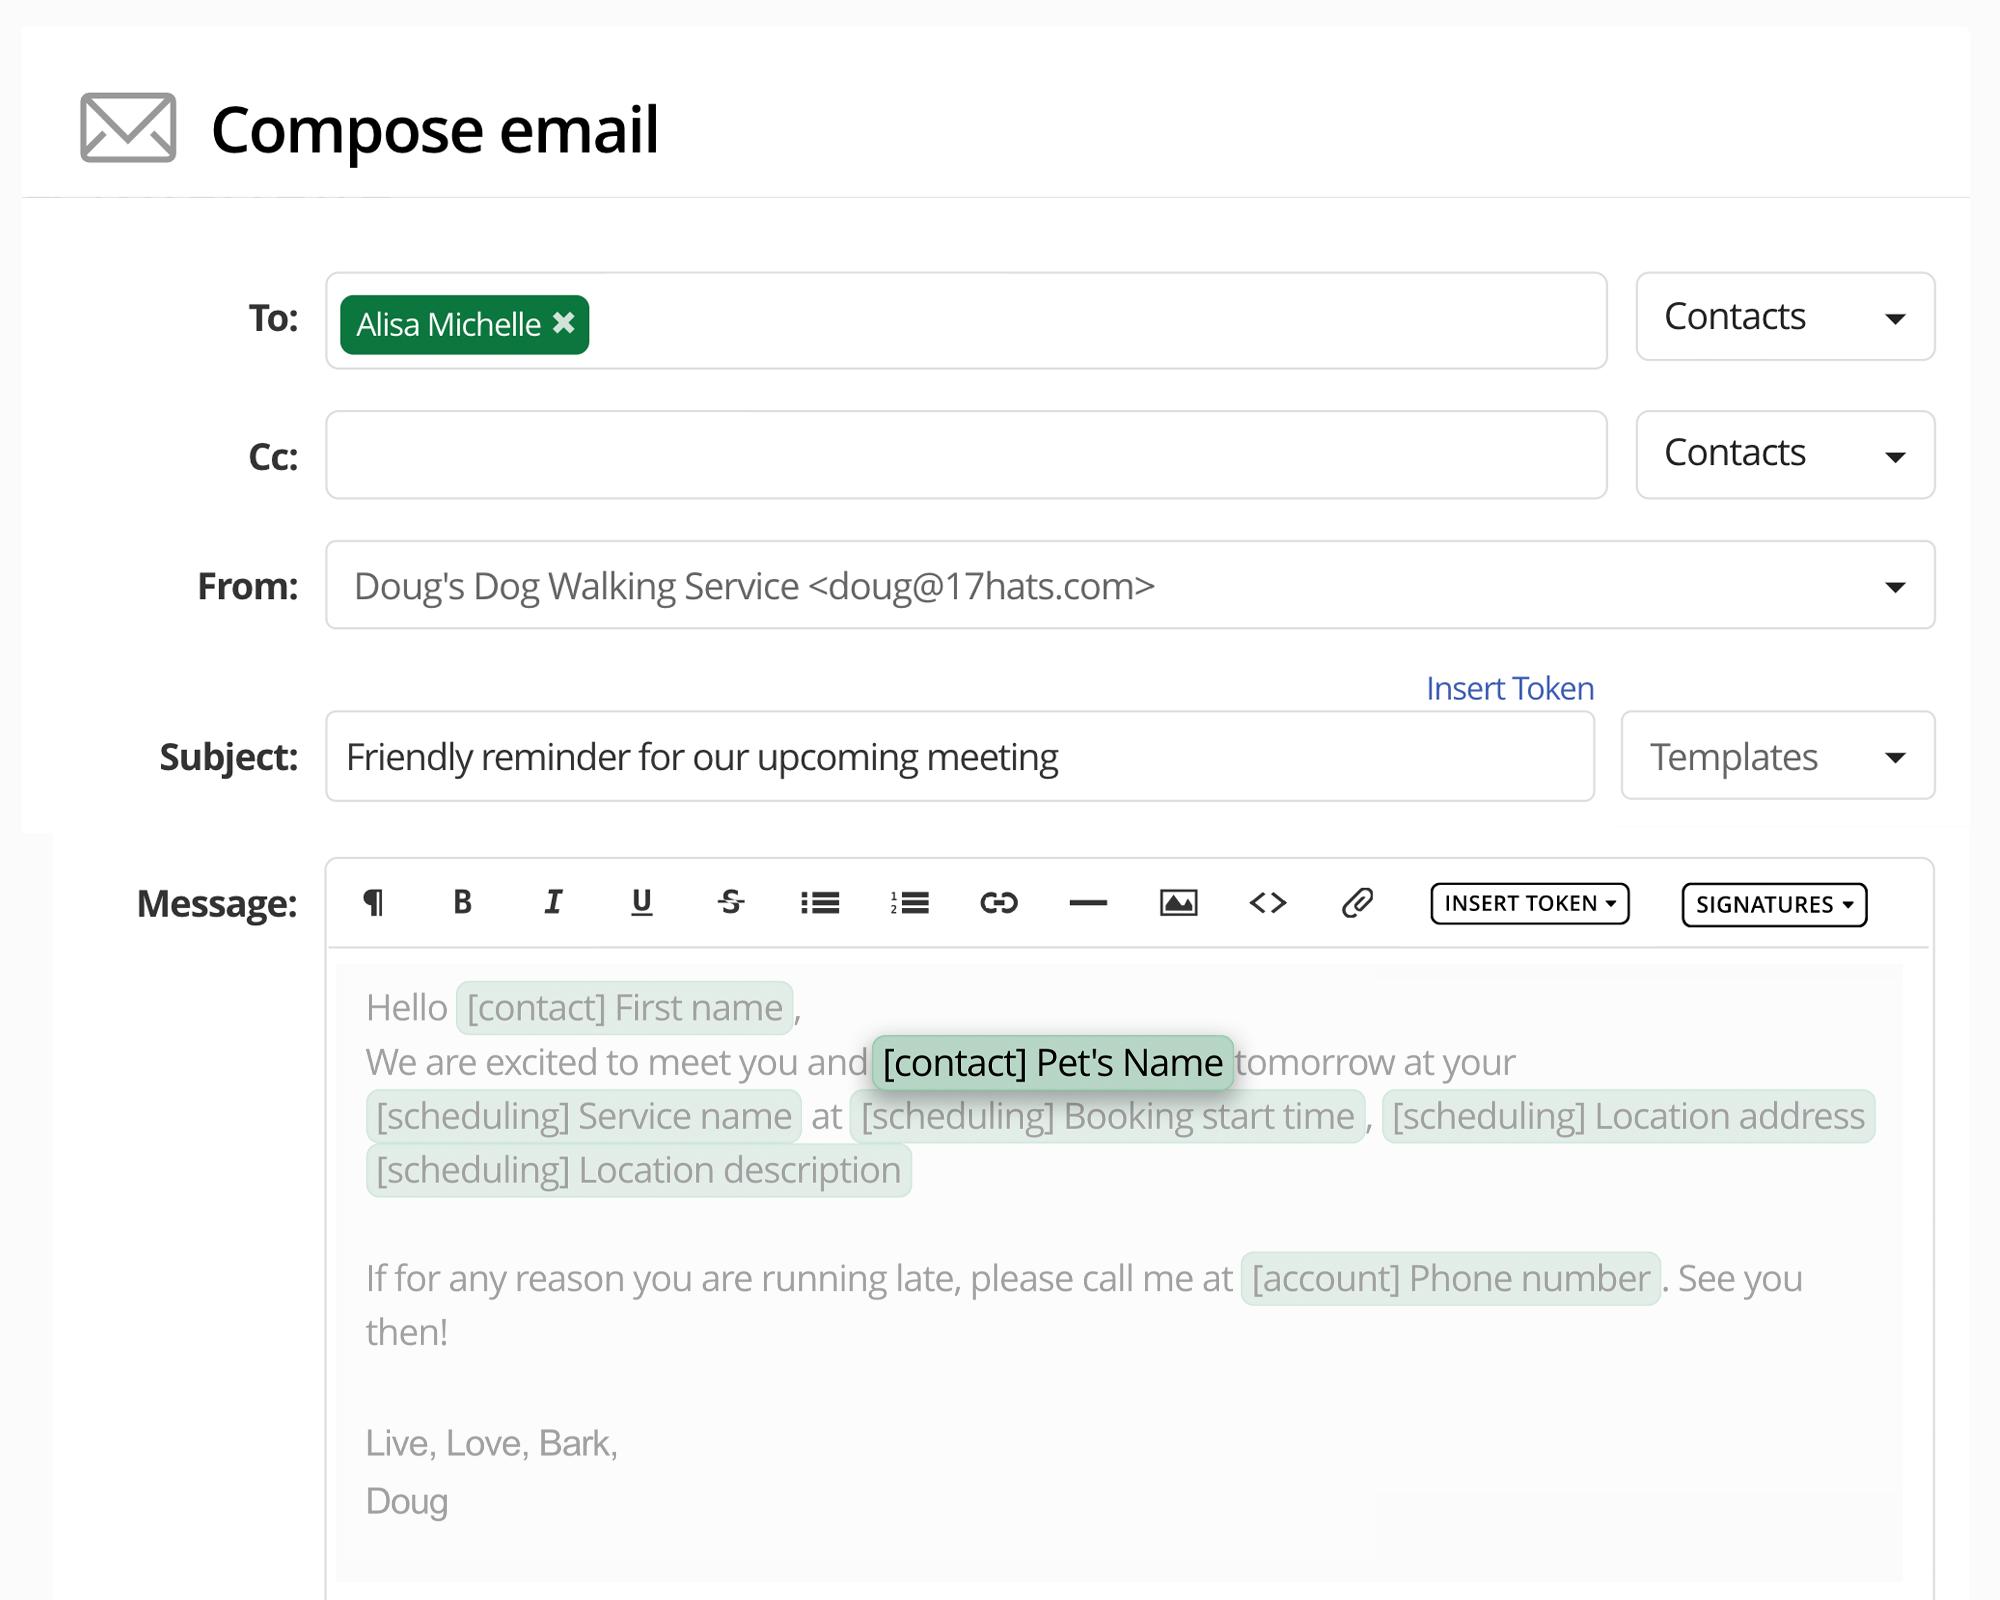 17hats Custom Fields In An Email